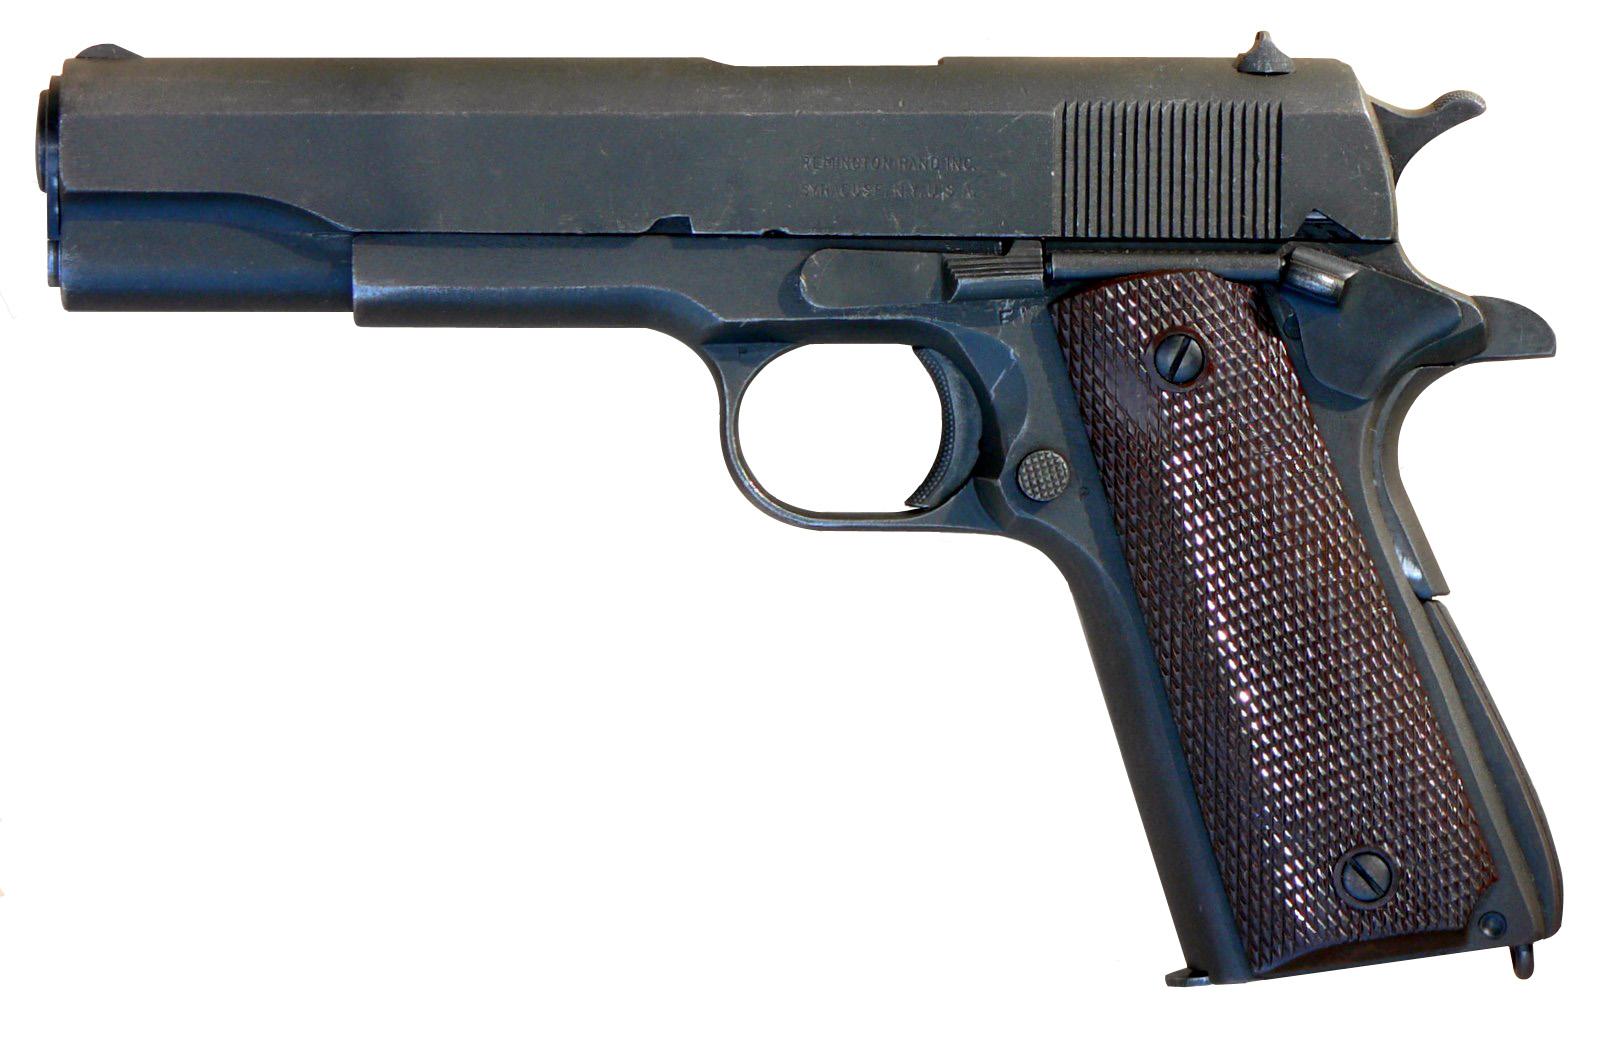 m1911-a1-pistol-wikipedia-.jpg